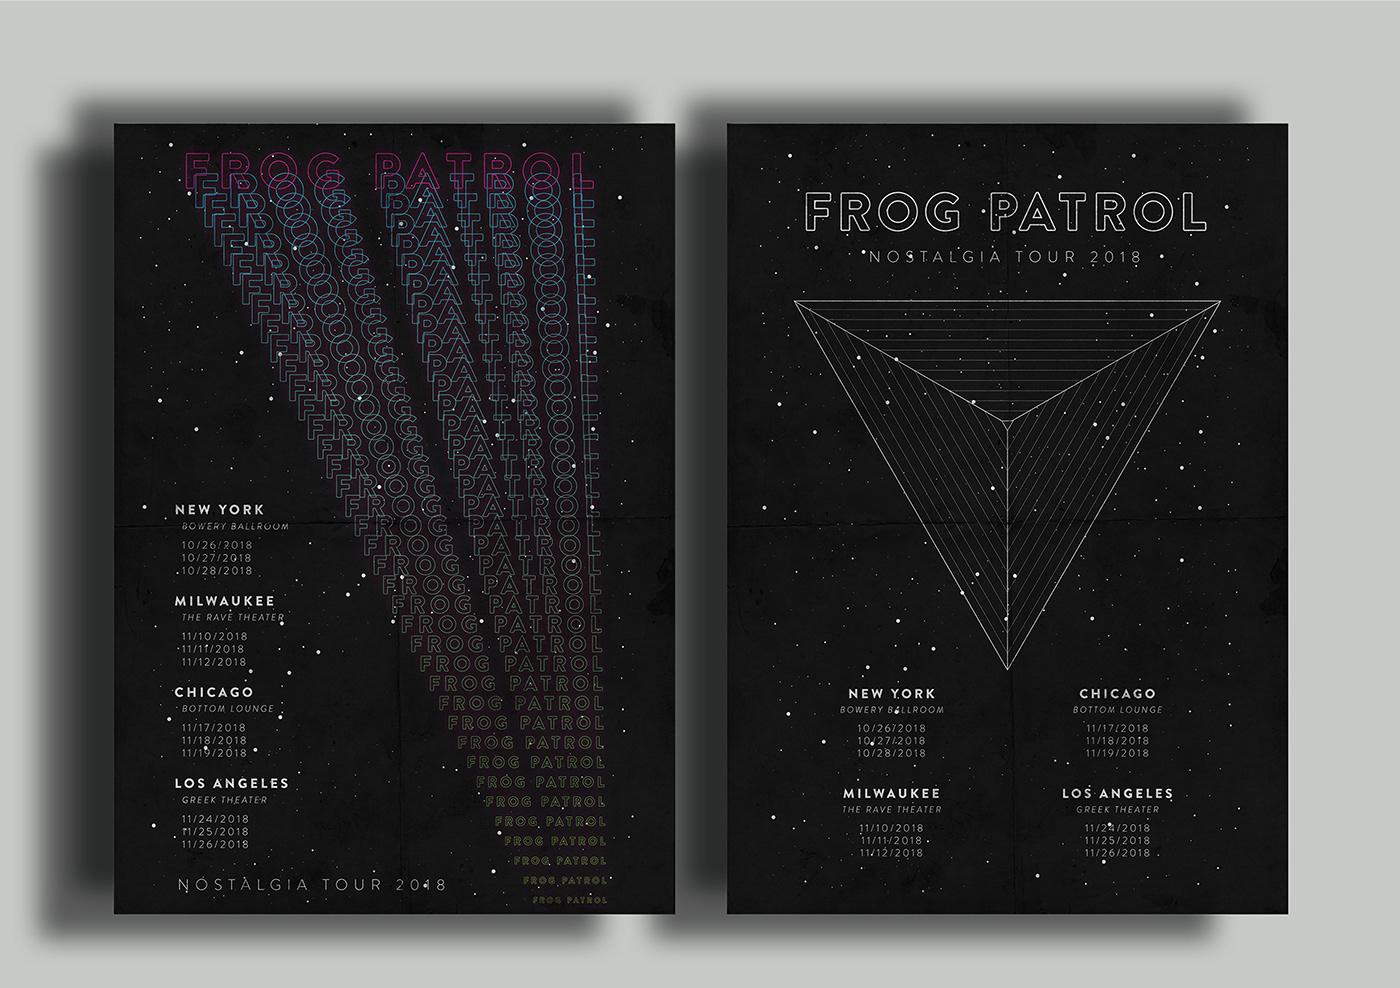 music frog patrol merchandise Album record band vector Space  random records concert